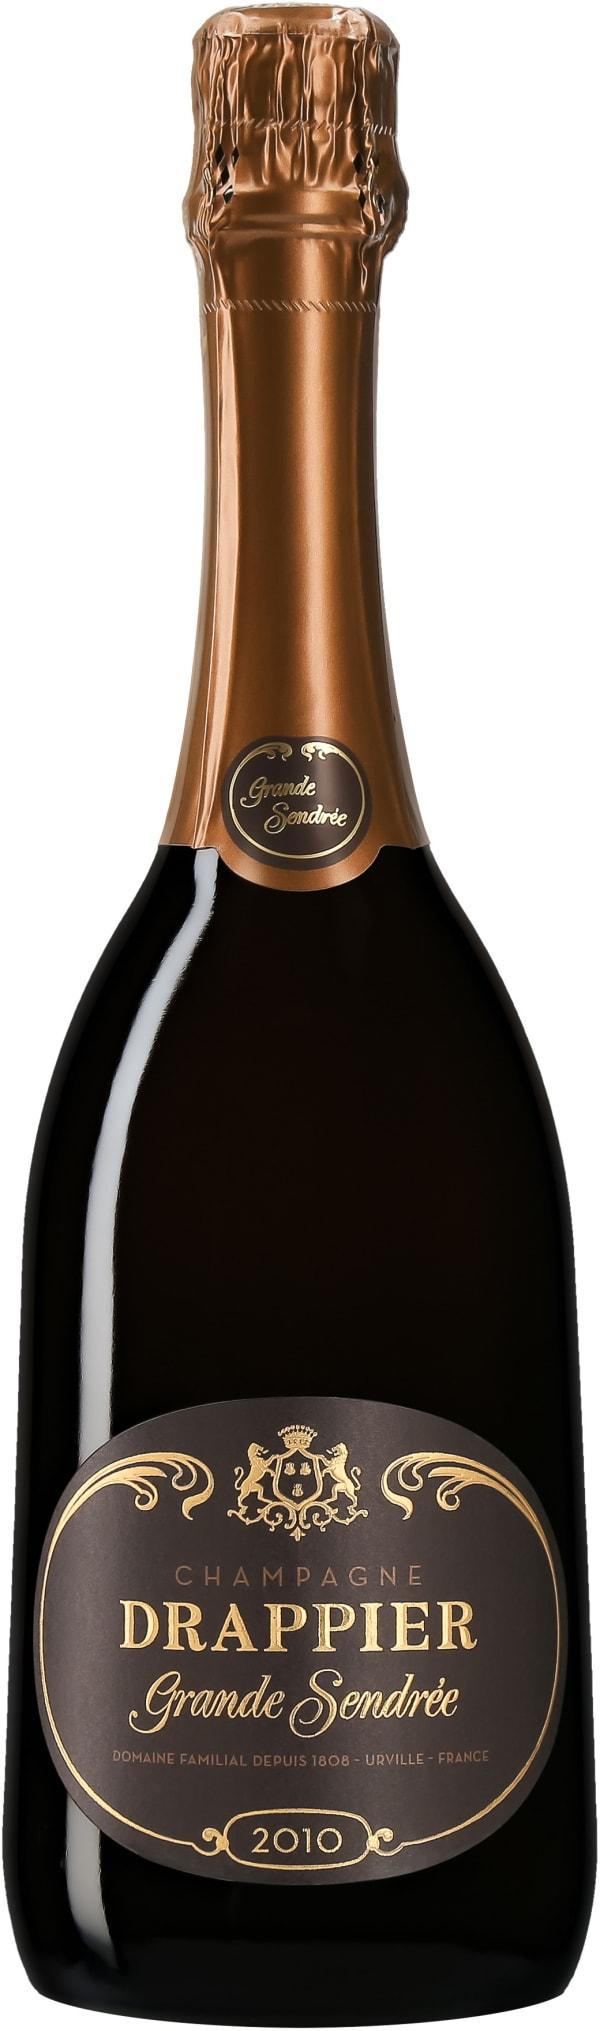 Drappier Grande Sendrée Champagne Brut 2009